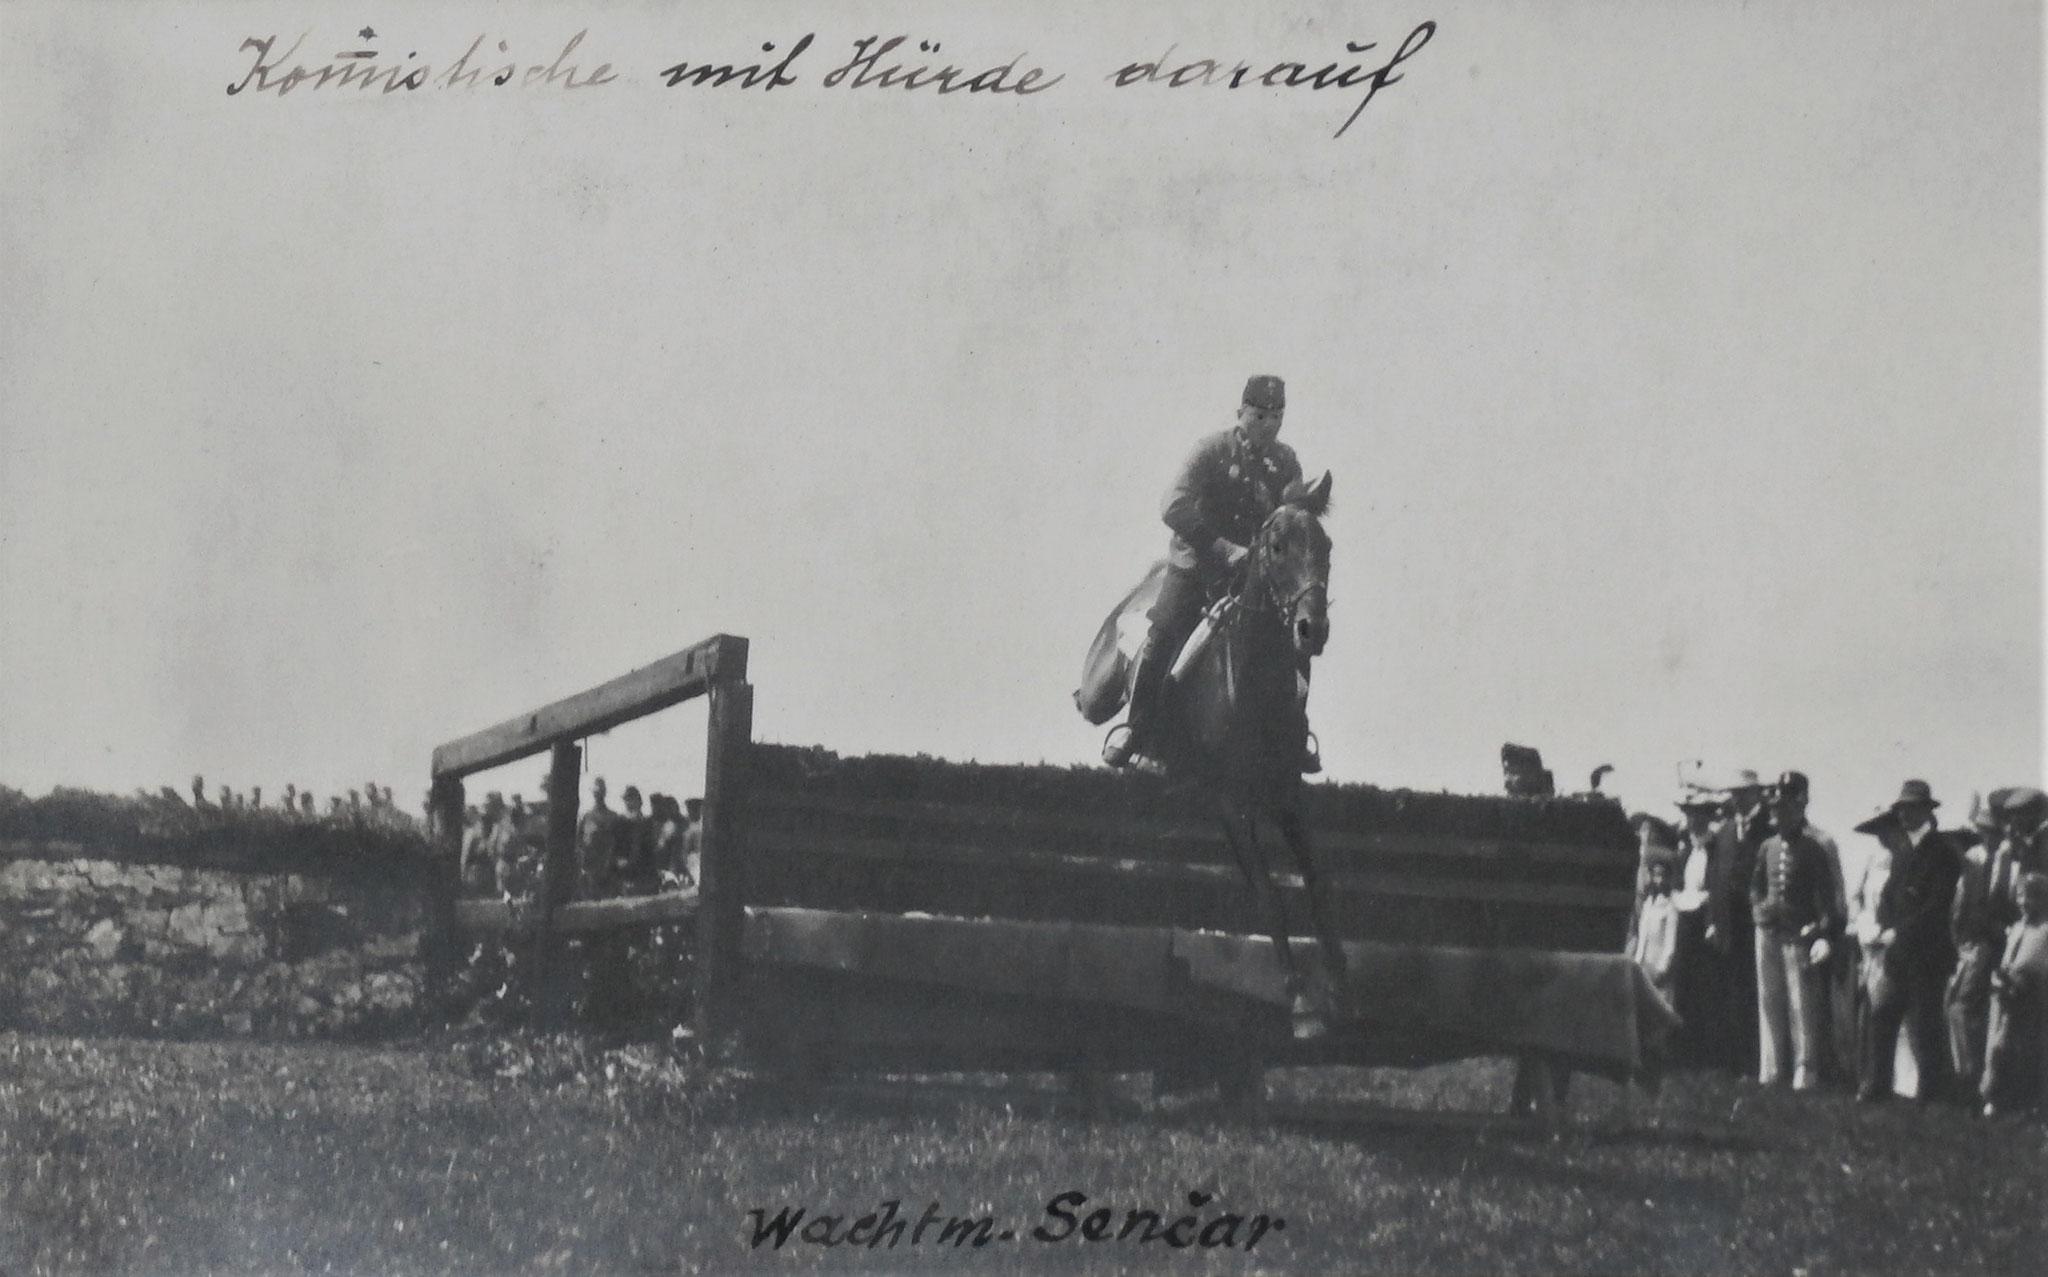 Wachtmeister Sencar